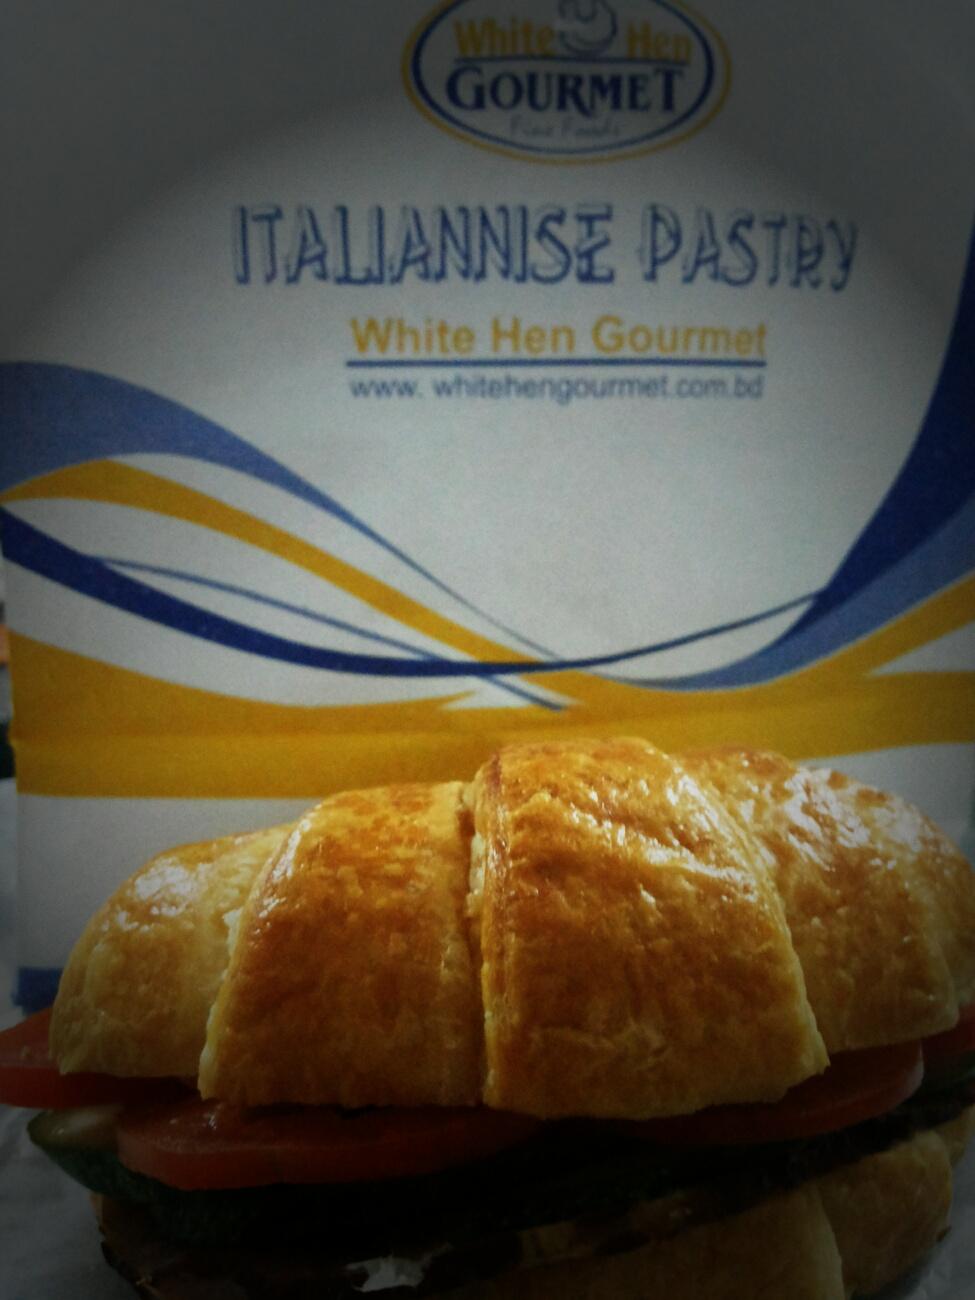 food, bangladesh, dhaka, banani, ham and cheese, croissant, pastries, white hen gourmet